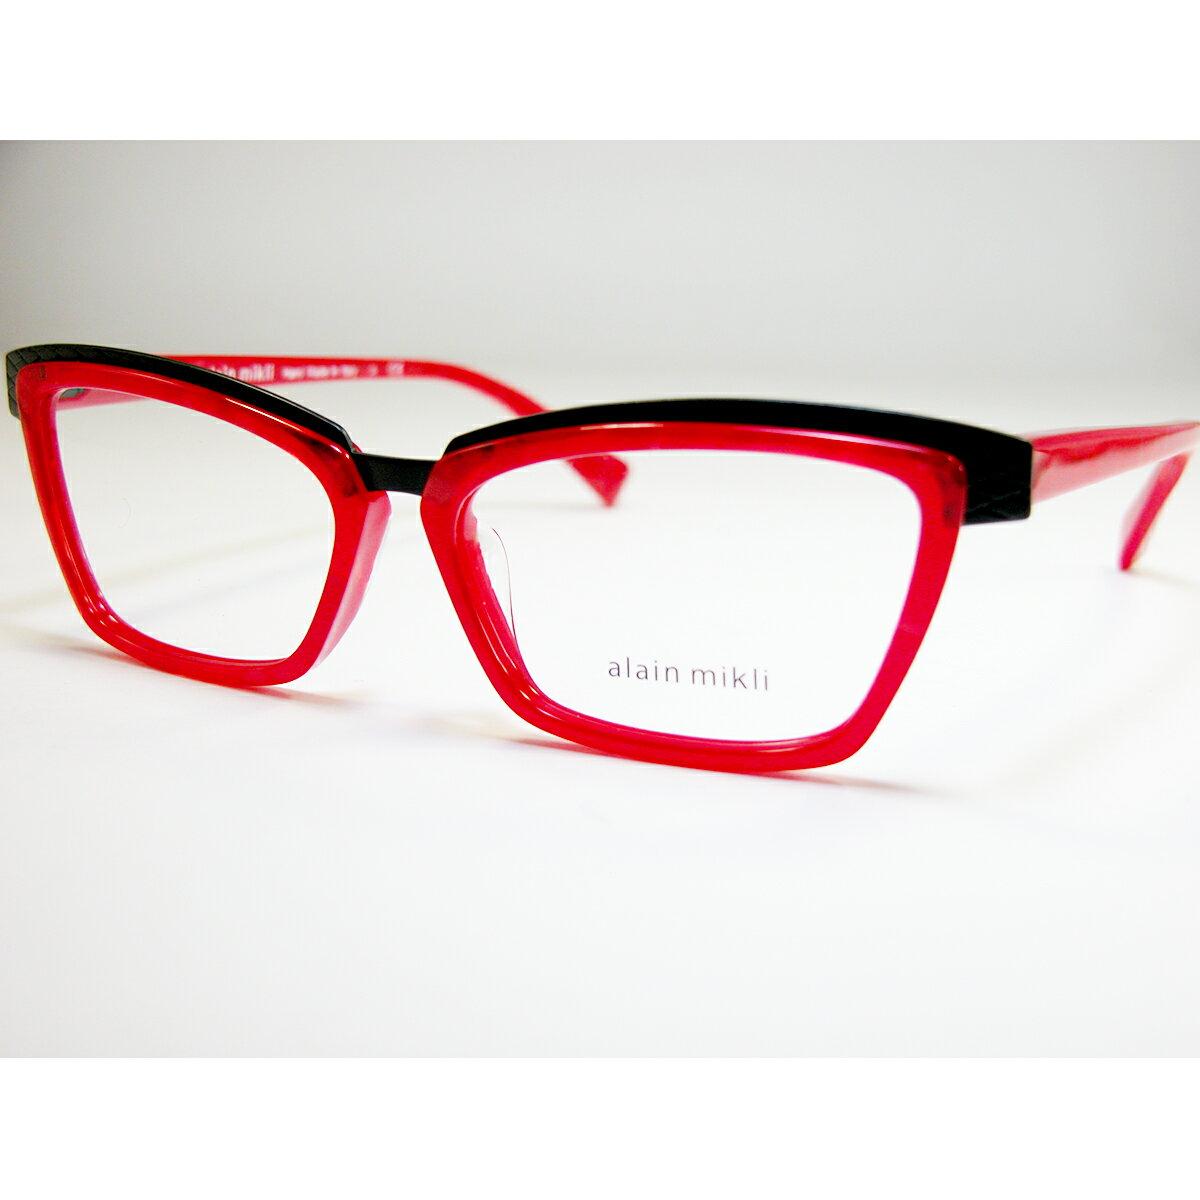 alain mikli アランミクリ メガネAO2015A カラー1055【楽ギフ_包装】 メンズ メガネ サングラス 眼鏡【ありがとう】【店頭受取対応商品】